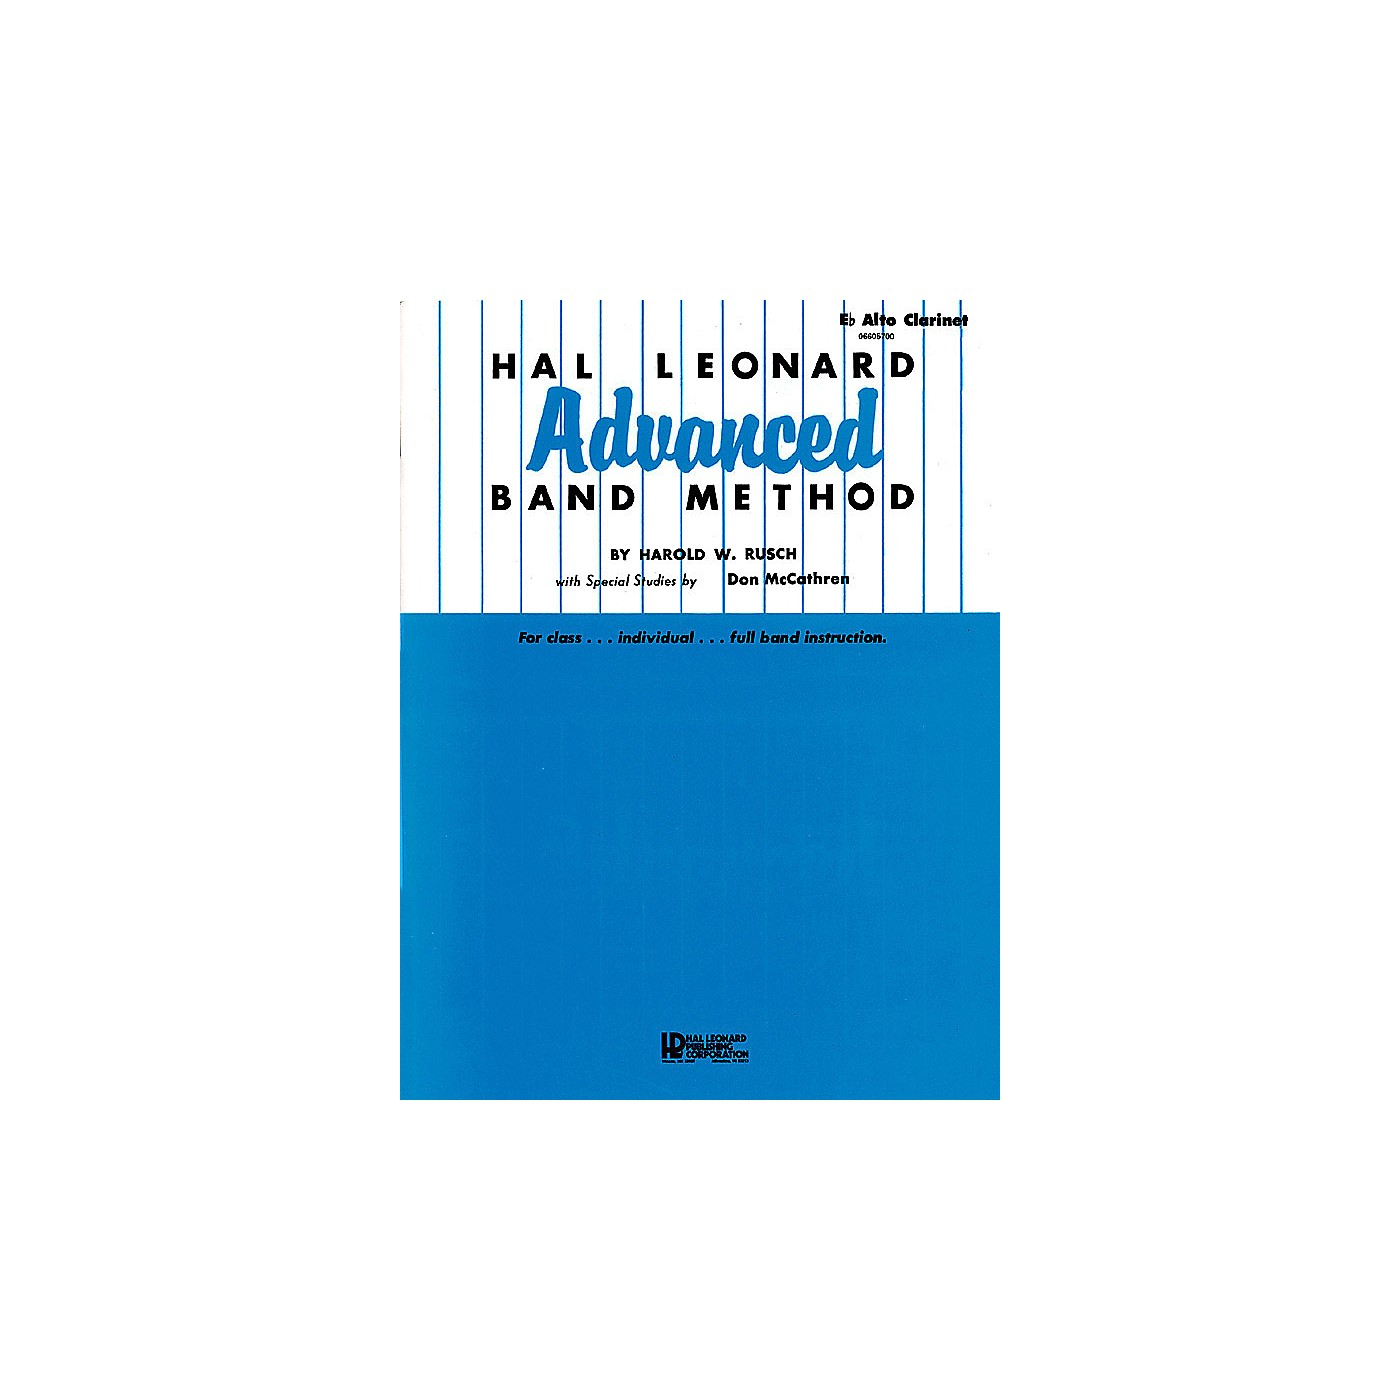 Hal Leonard Hal Leonard Advanced Band Method (E-flat Alto Clarinet) Advanced Band Method Series by Harold W. Rusch thumbnail